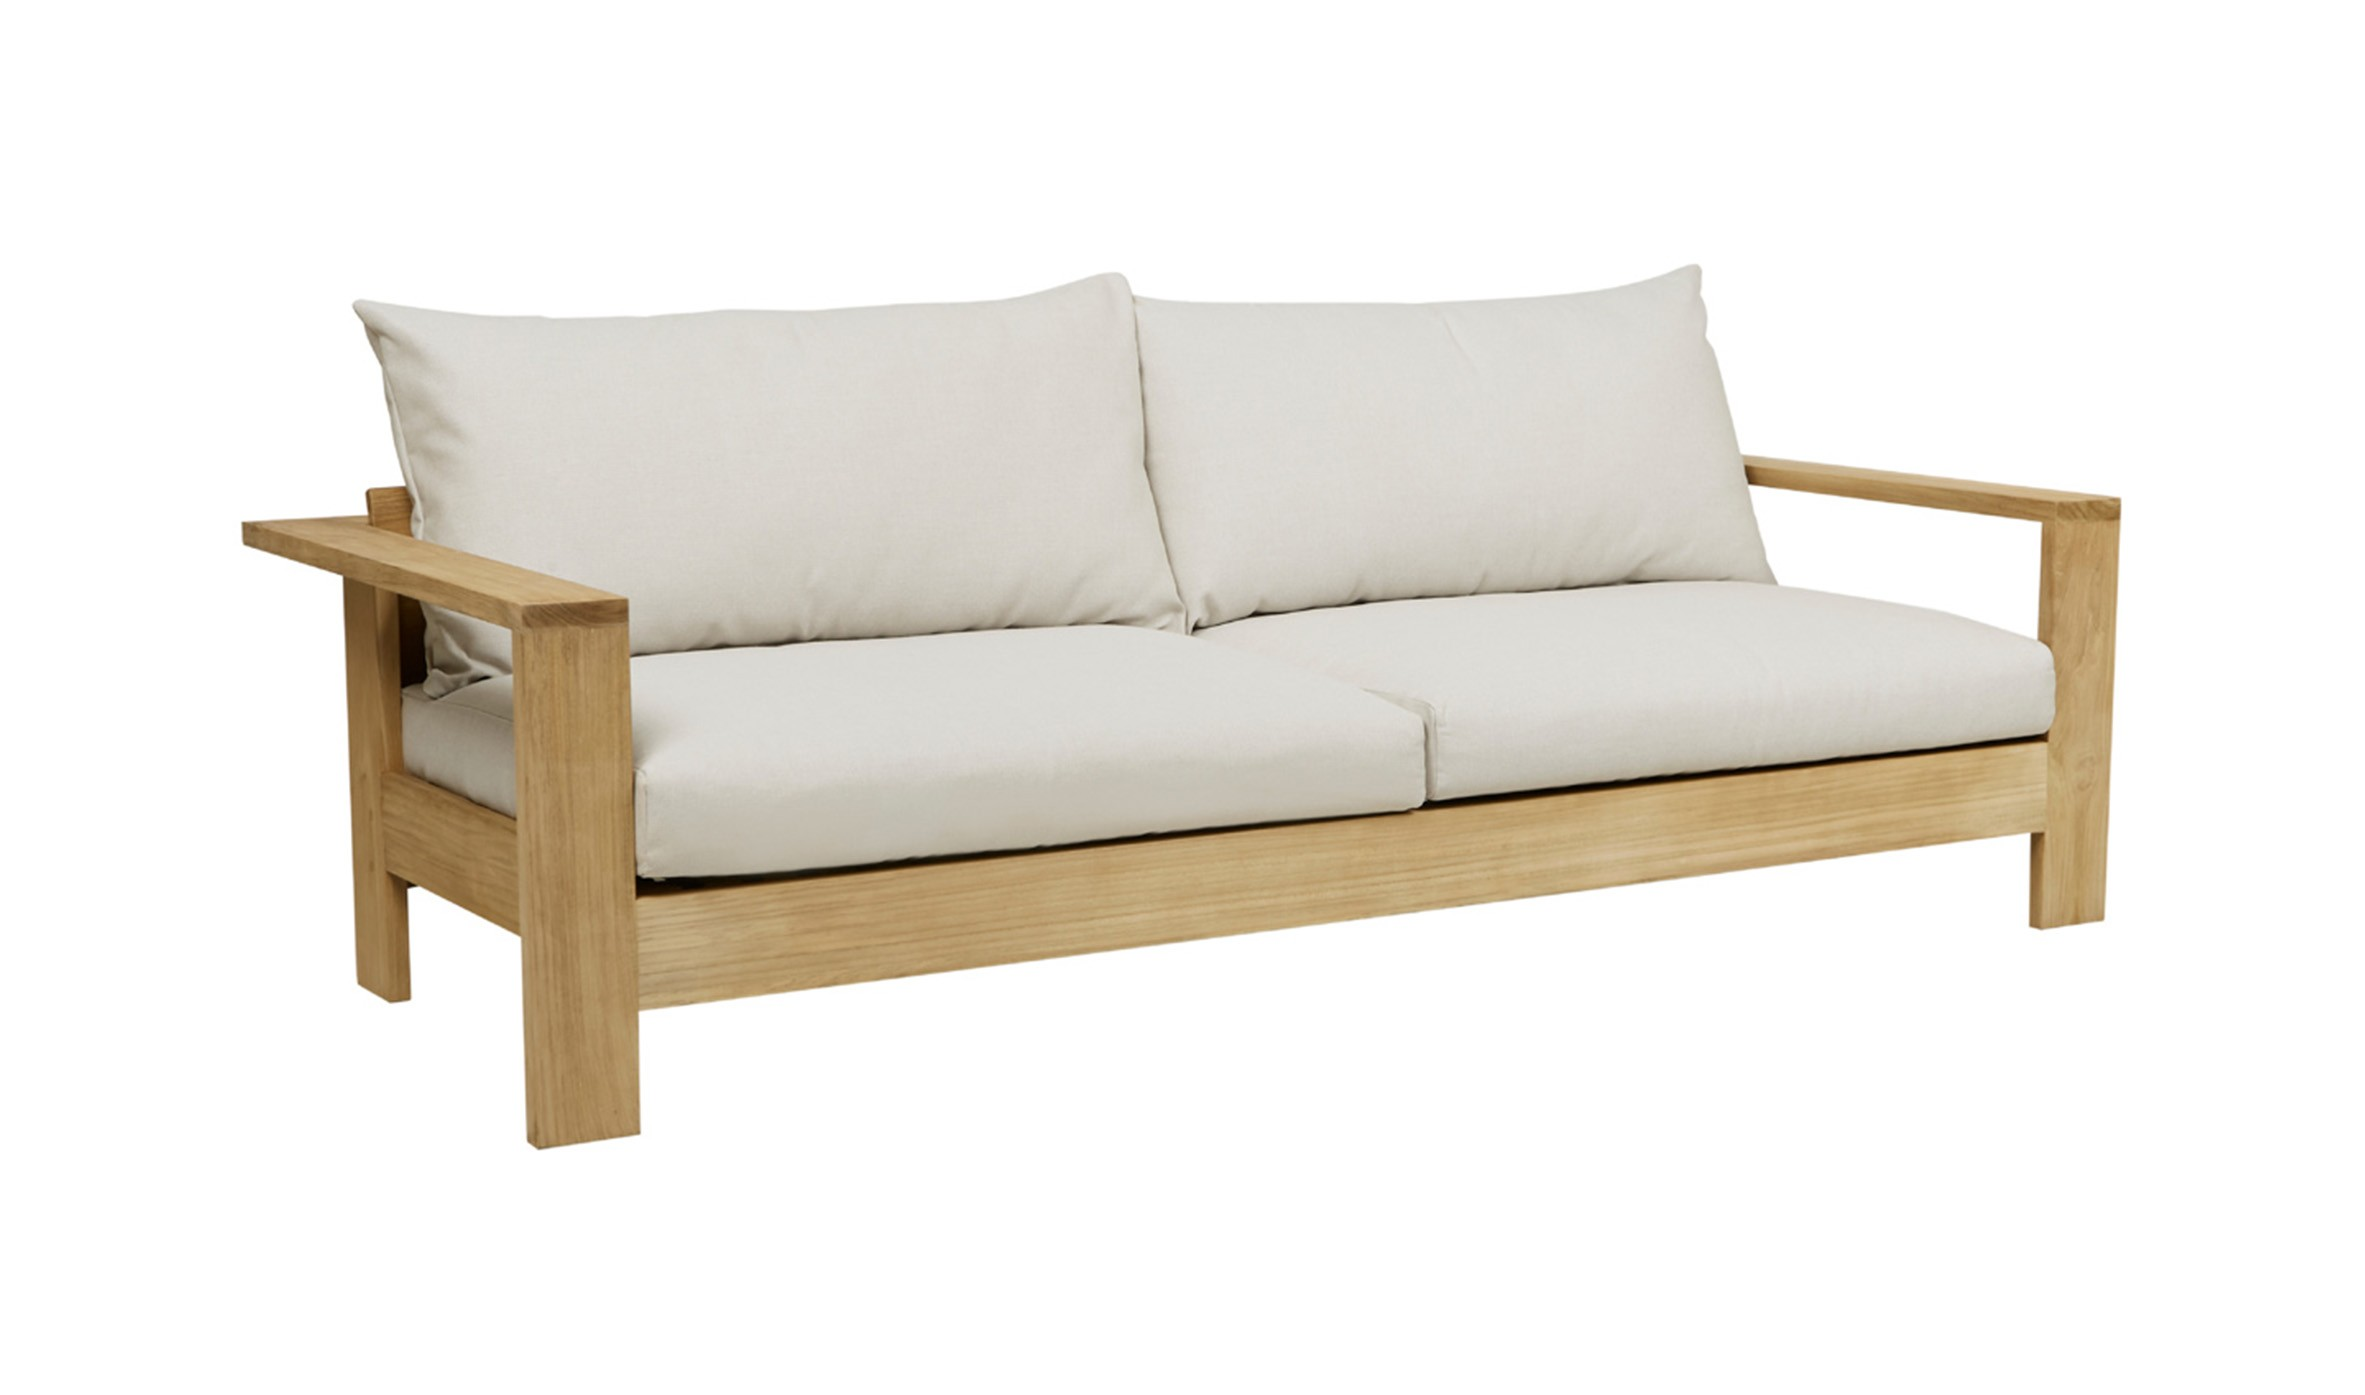 Furniture Thumbnails outdoor-sofas-hamptons-3-seat